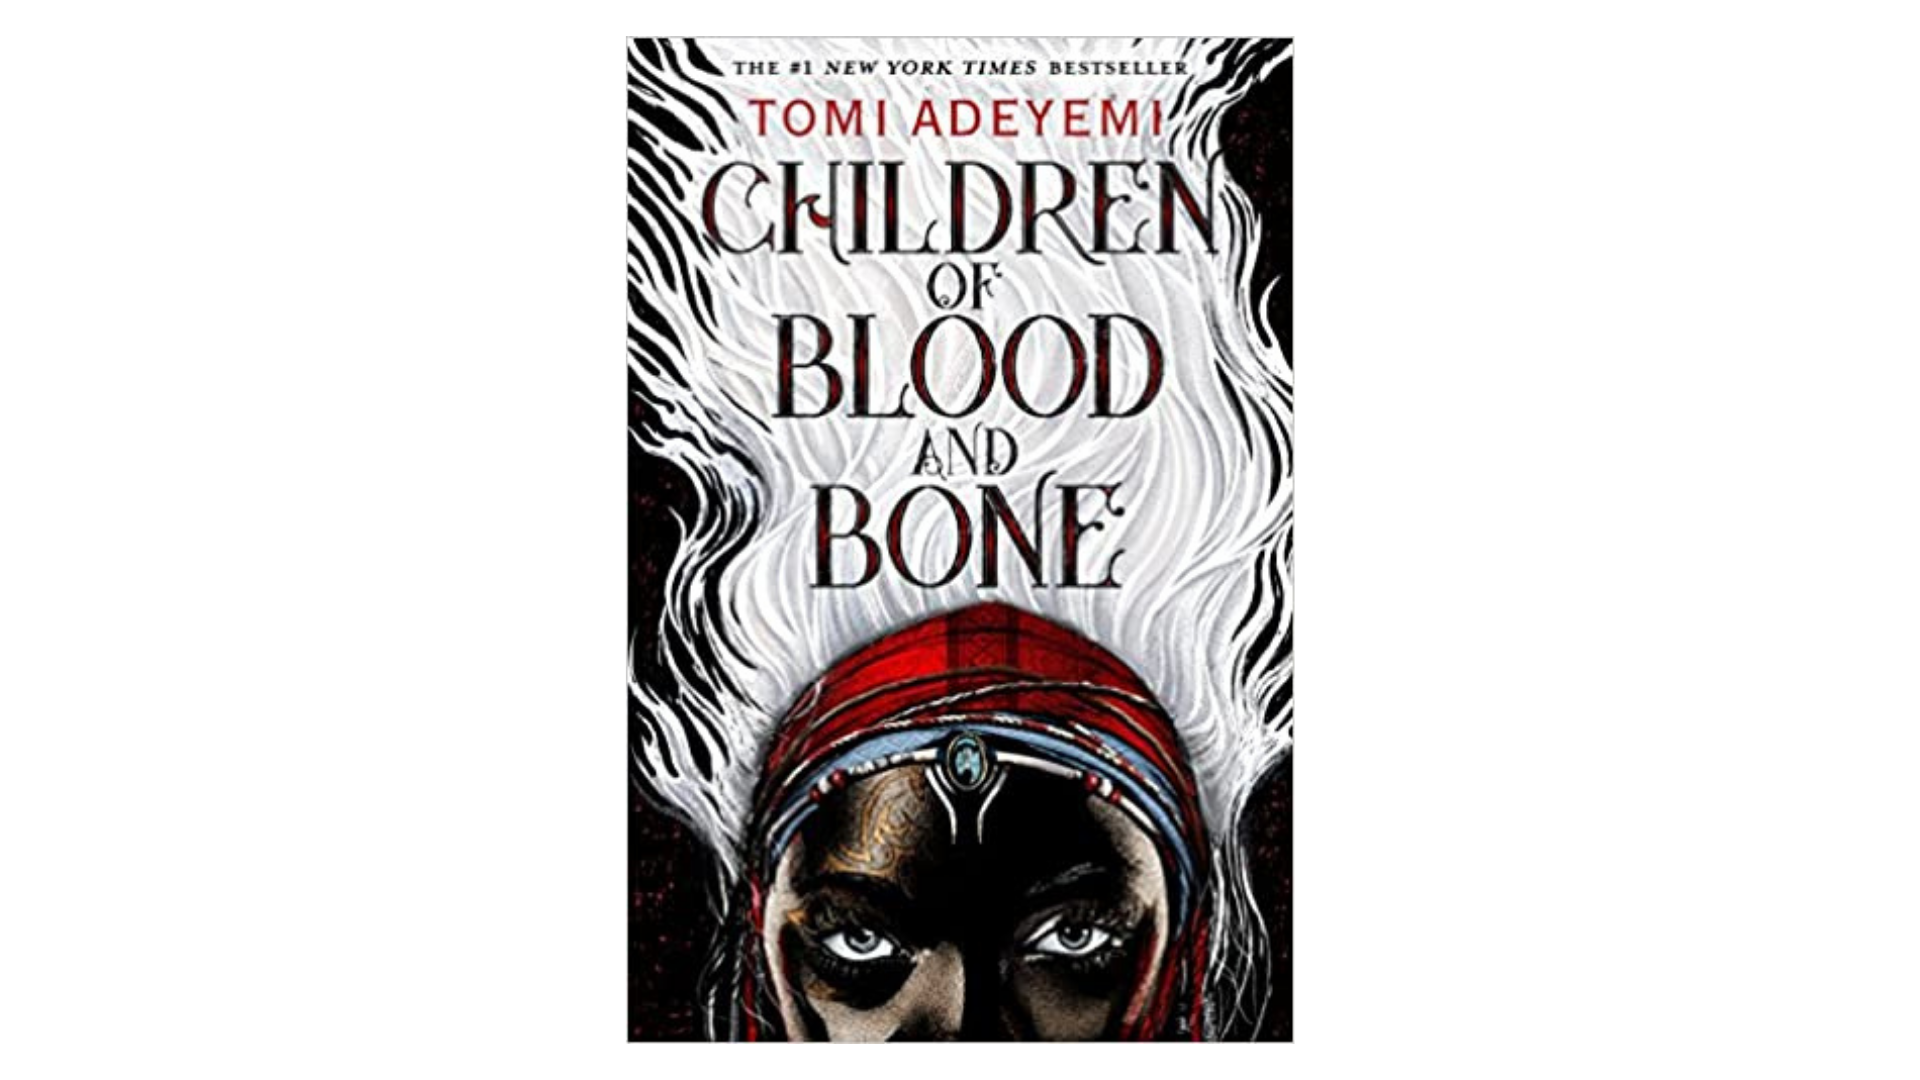 Toni Adeyemi best books by black authors